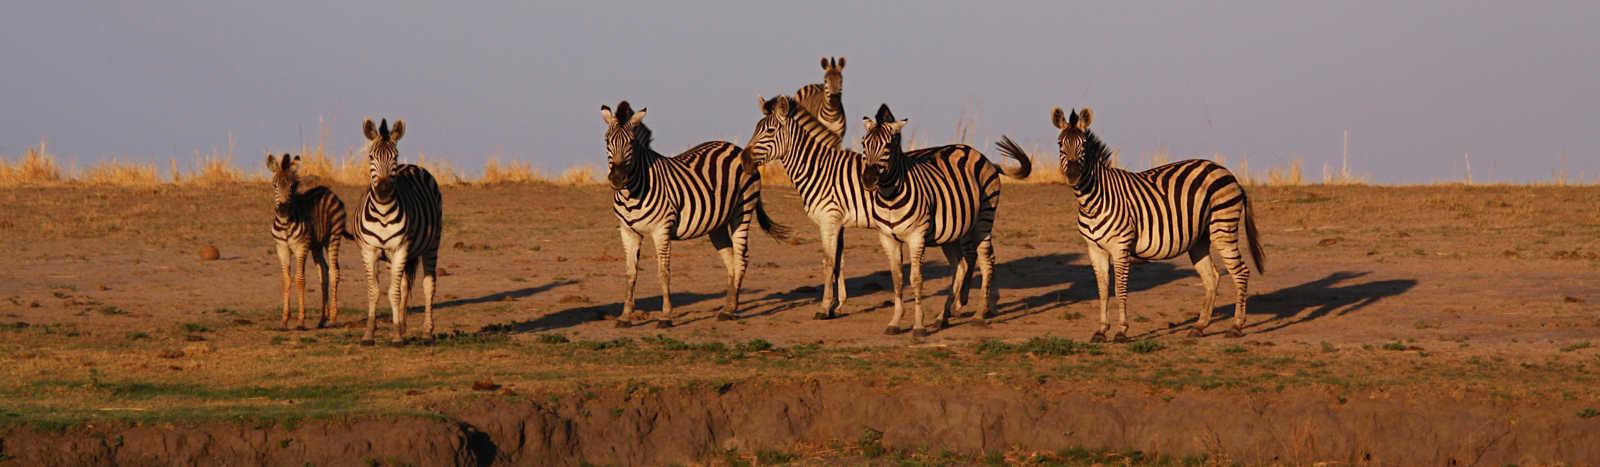 A group of zebra on the floodplains of the Chobe River in Chobe National Park, Botswana